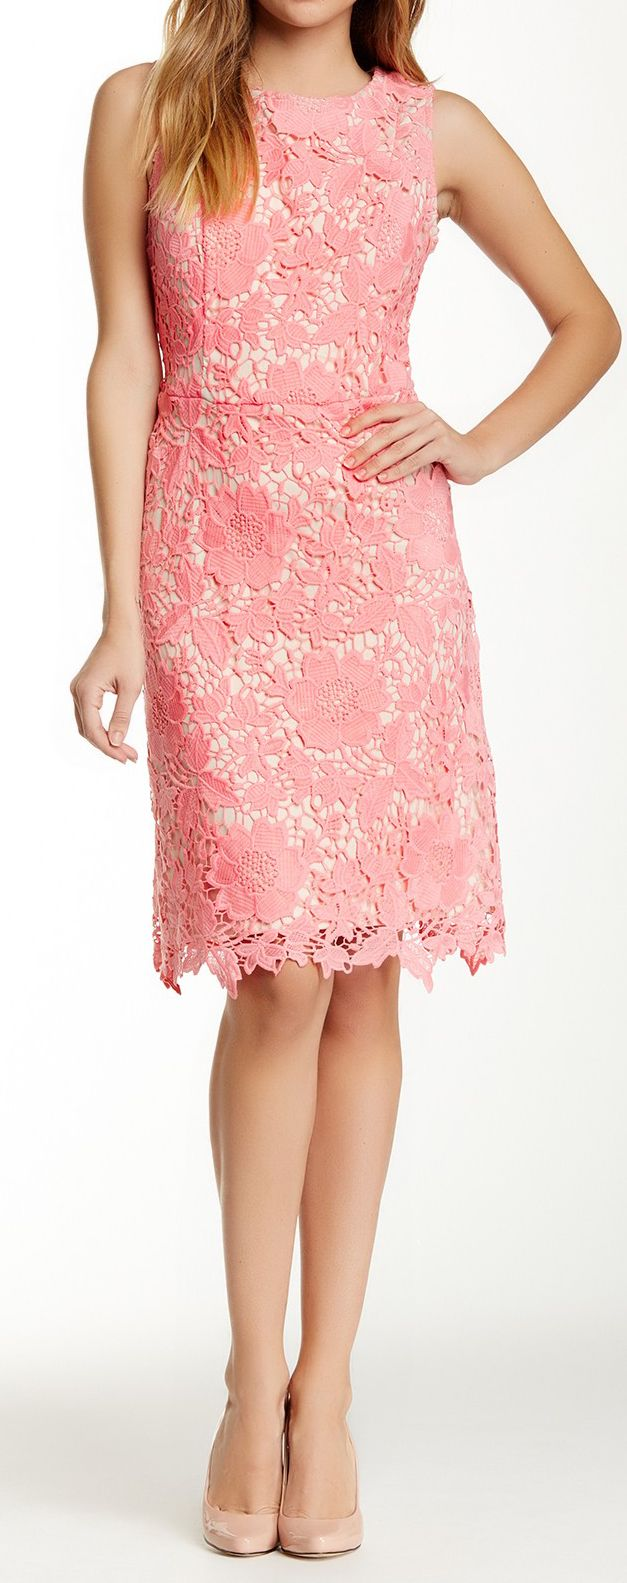 Petal pink crochet lace dress